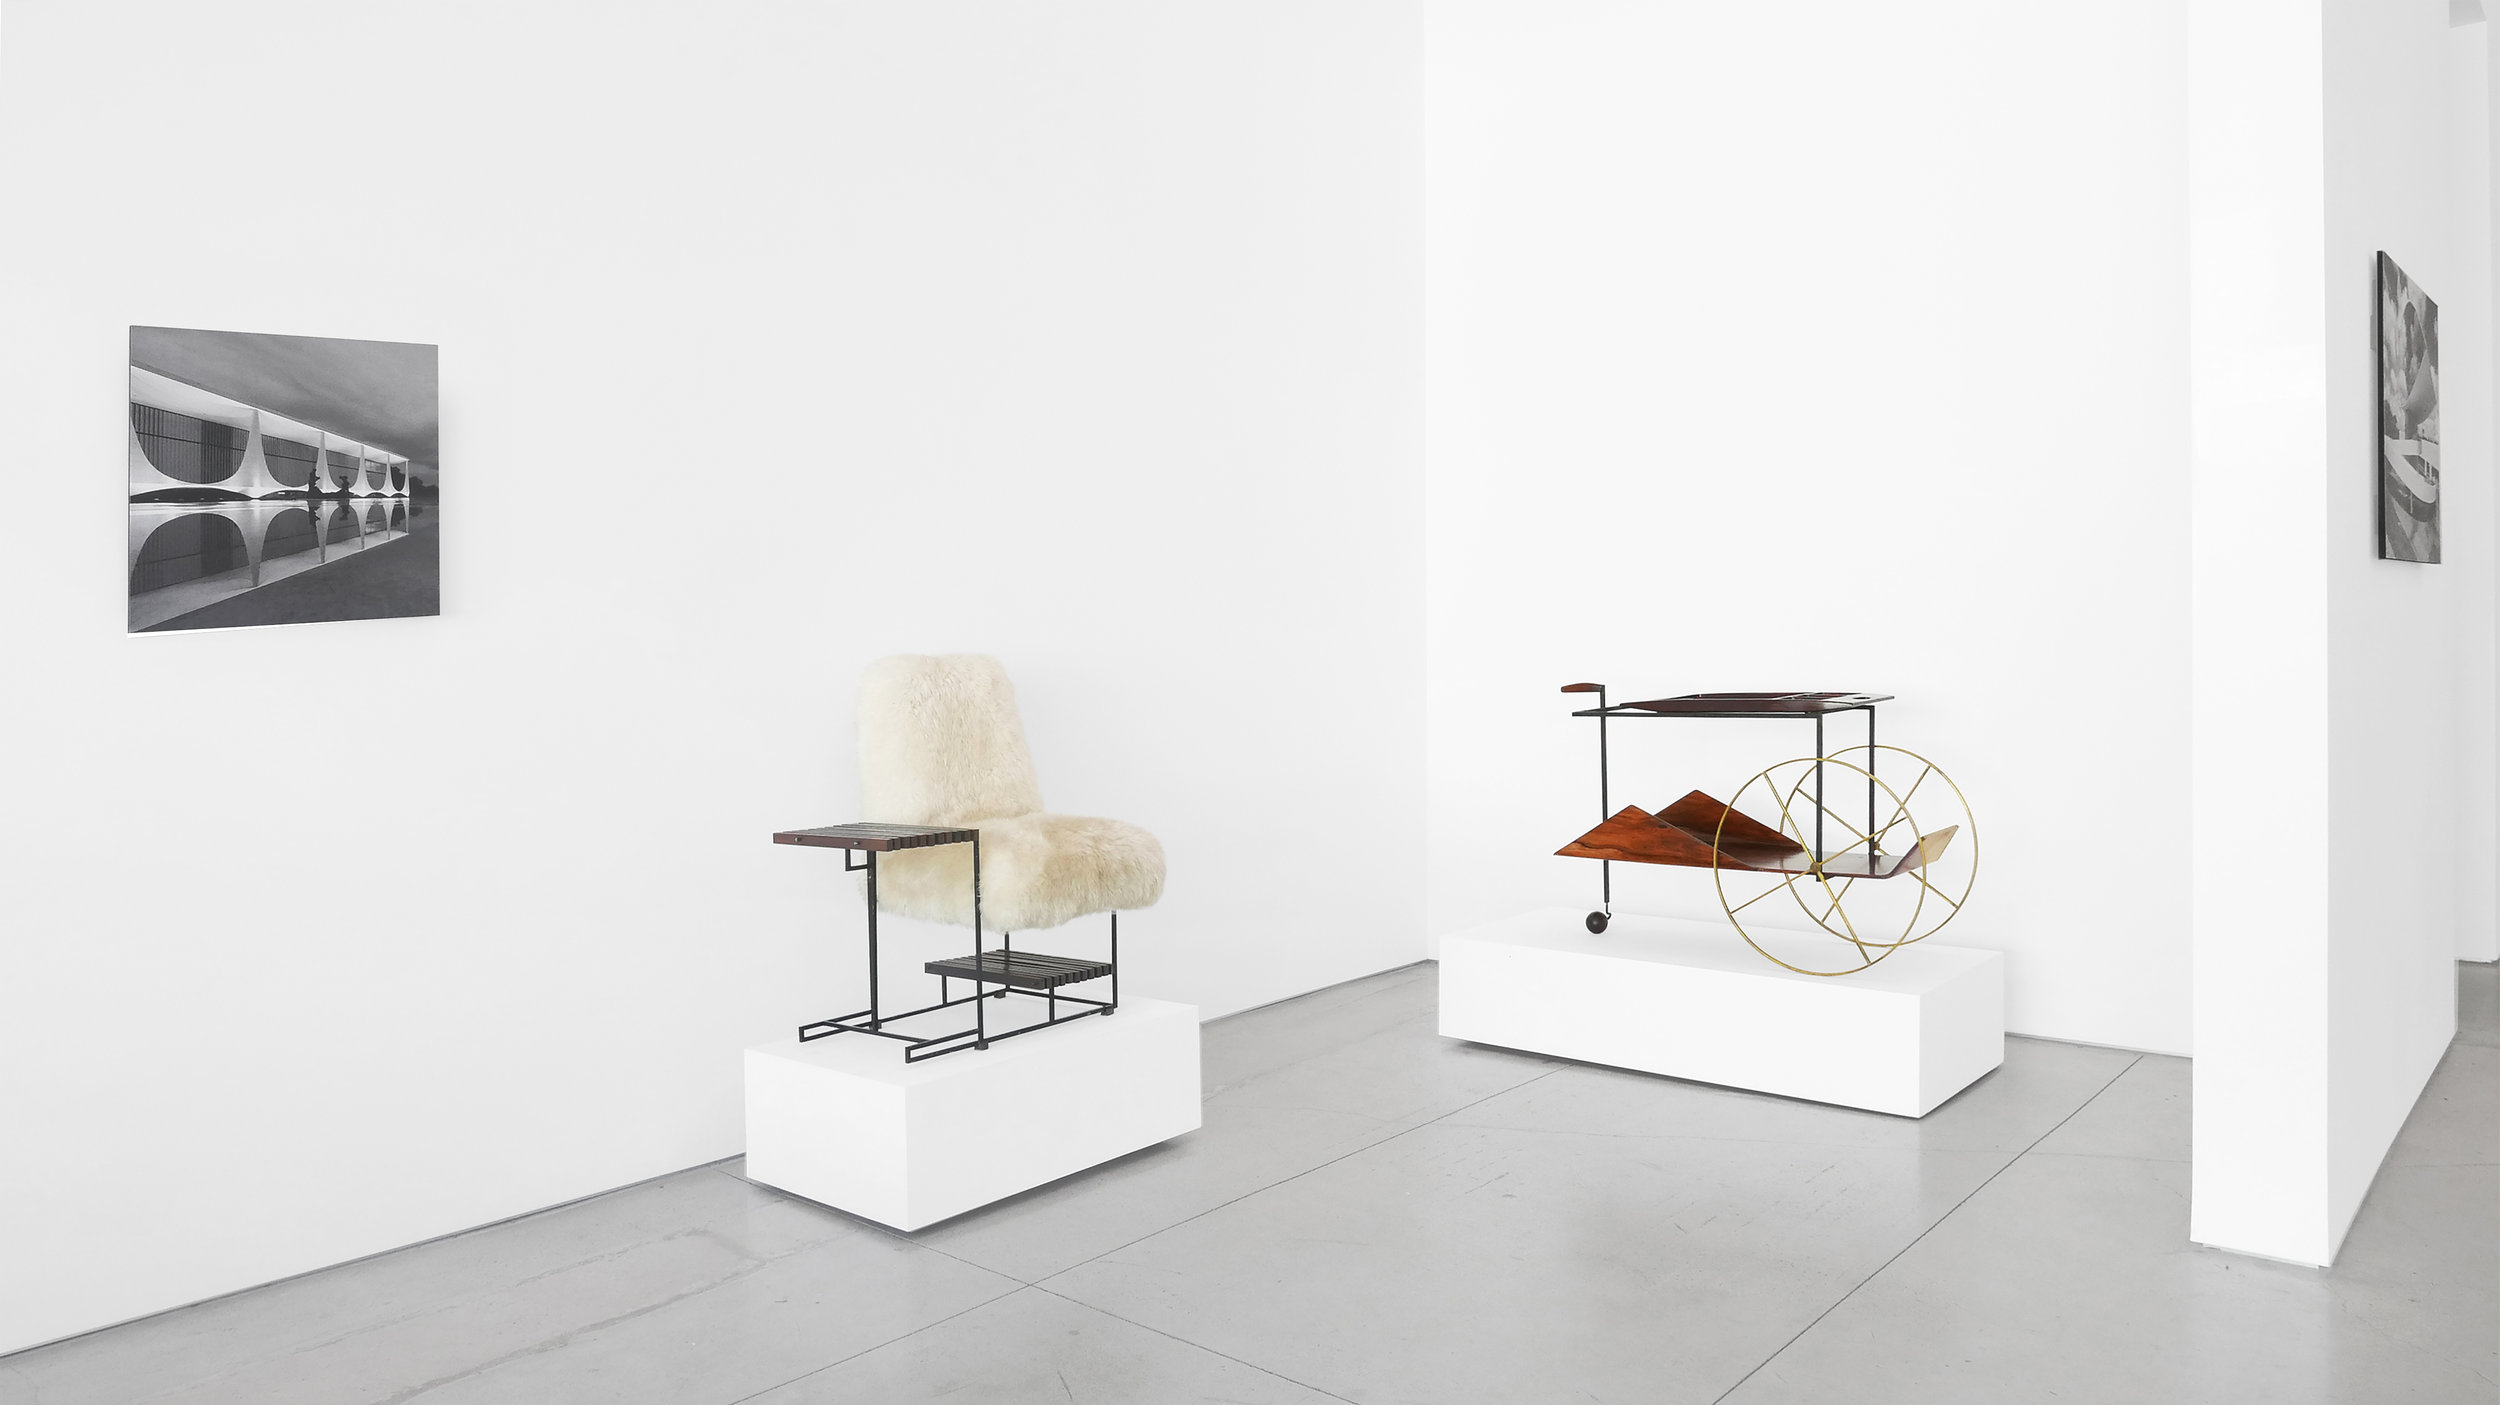 Design Brasileiro, Curated by Ulysses de Santi, Peter Blake Gallery, 2018, Installation View_01.jpg